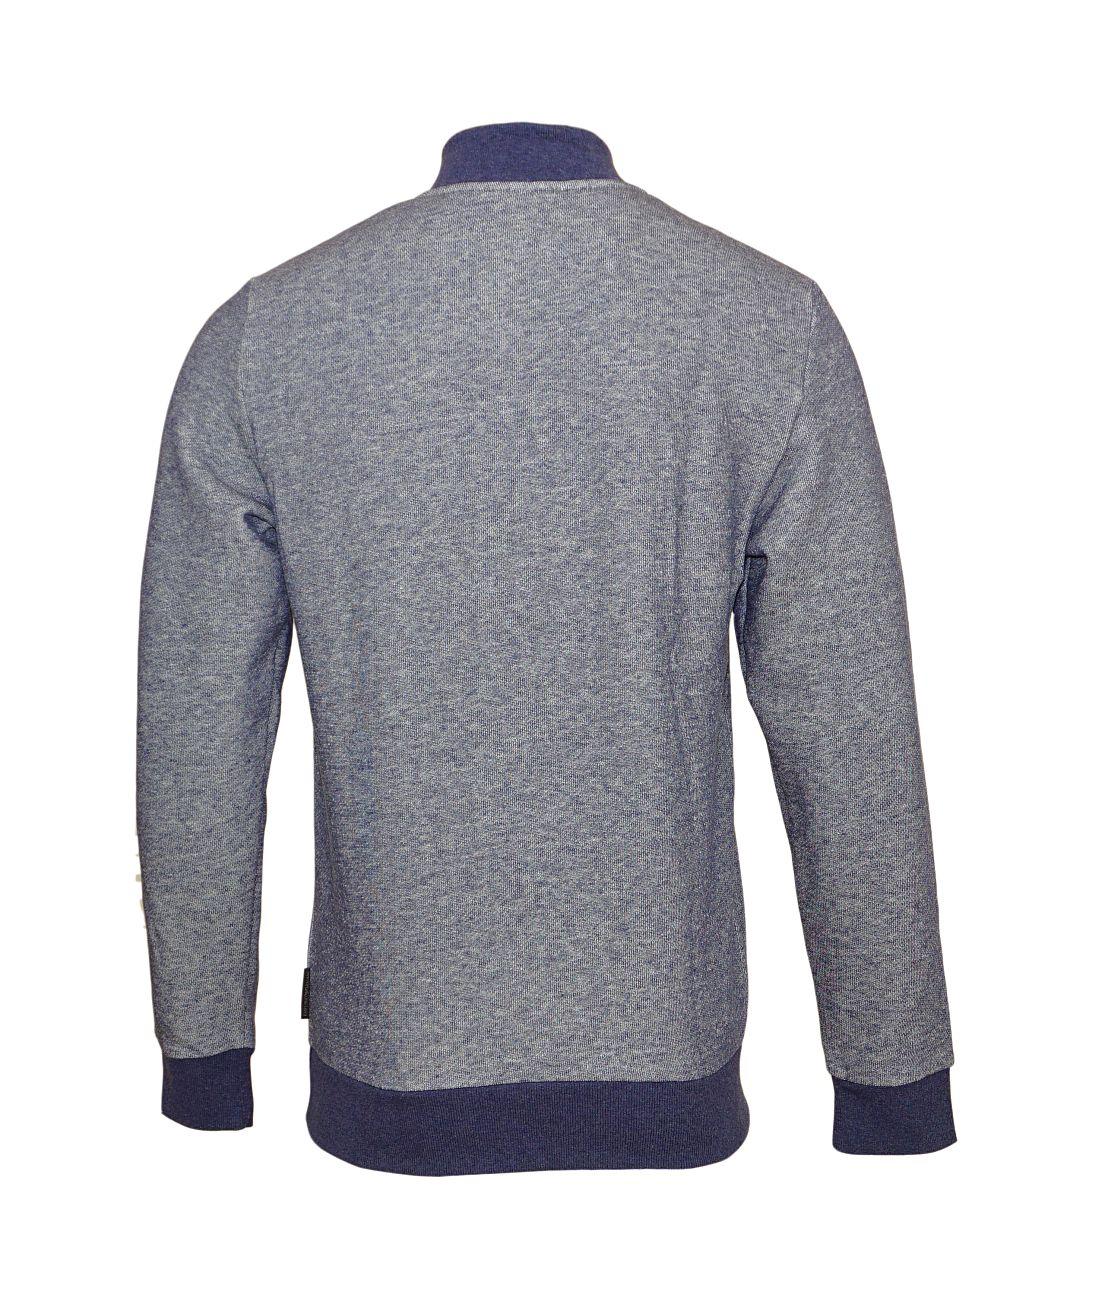 Emporio Armani Pullover Sweater Zip 111704 8A575 52635 BLU MELANGE WX18-EAS